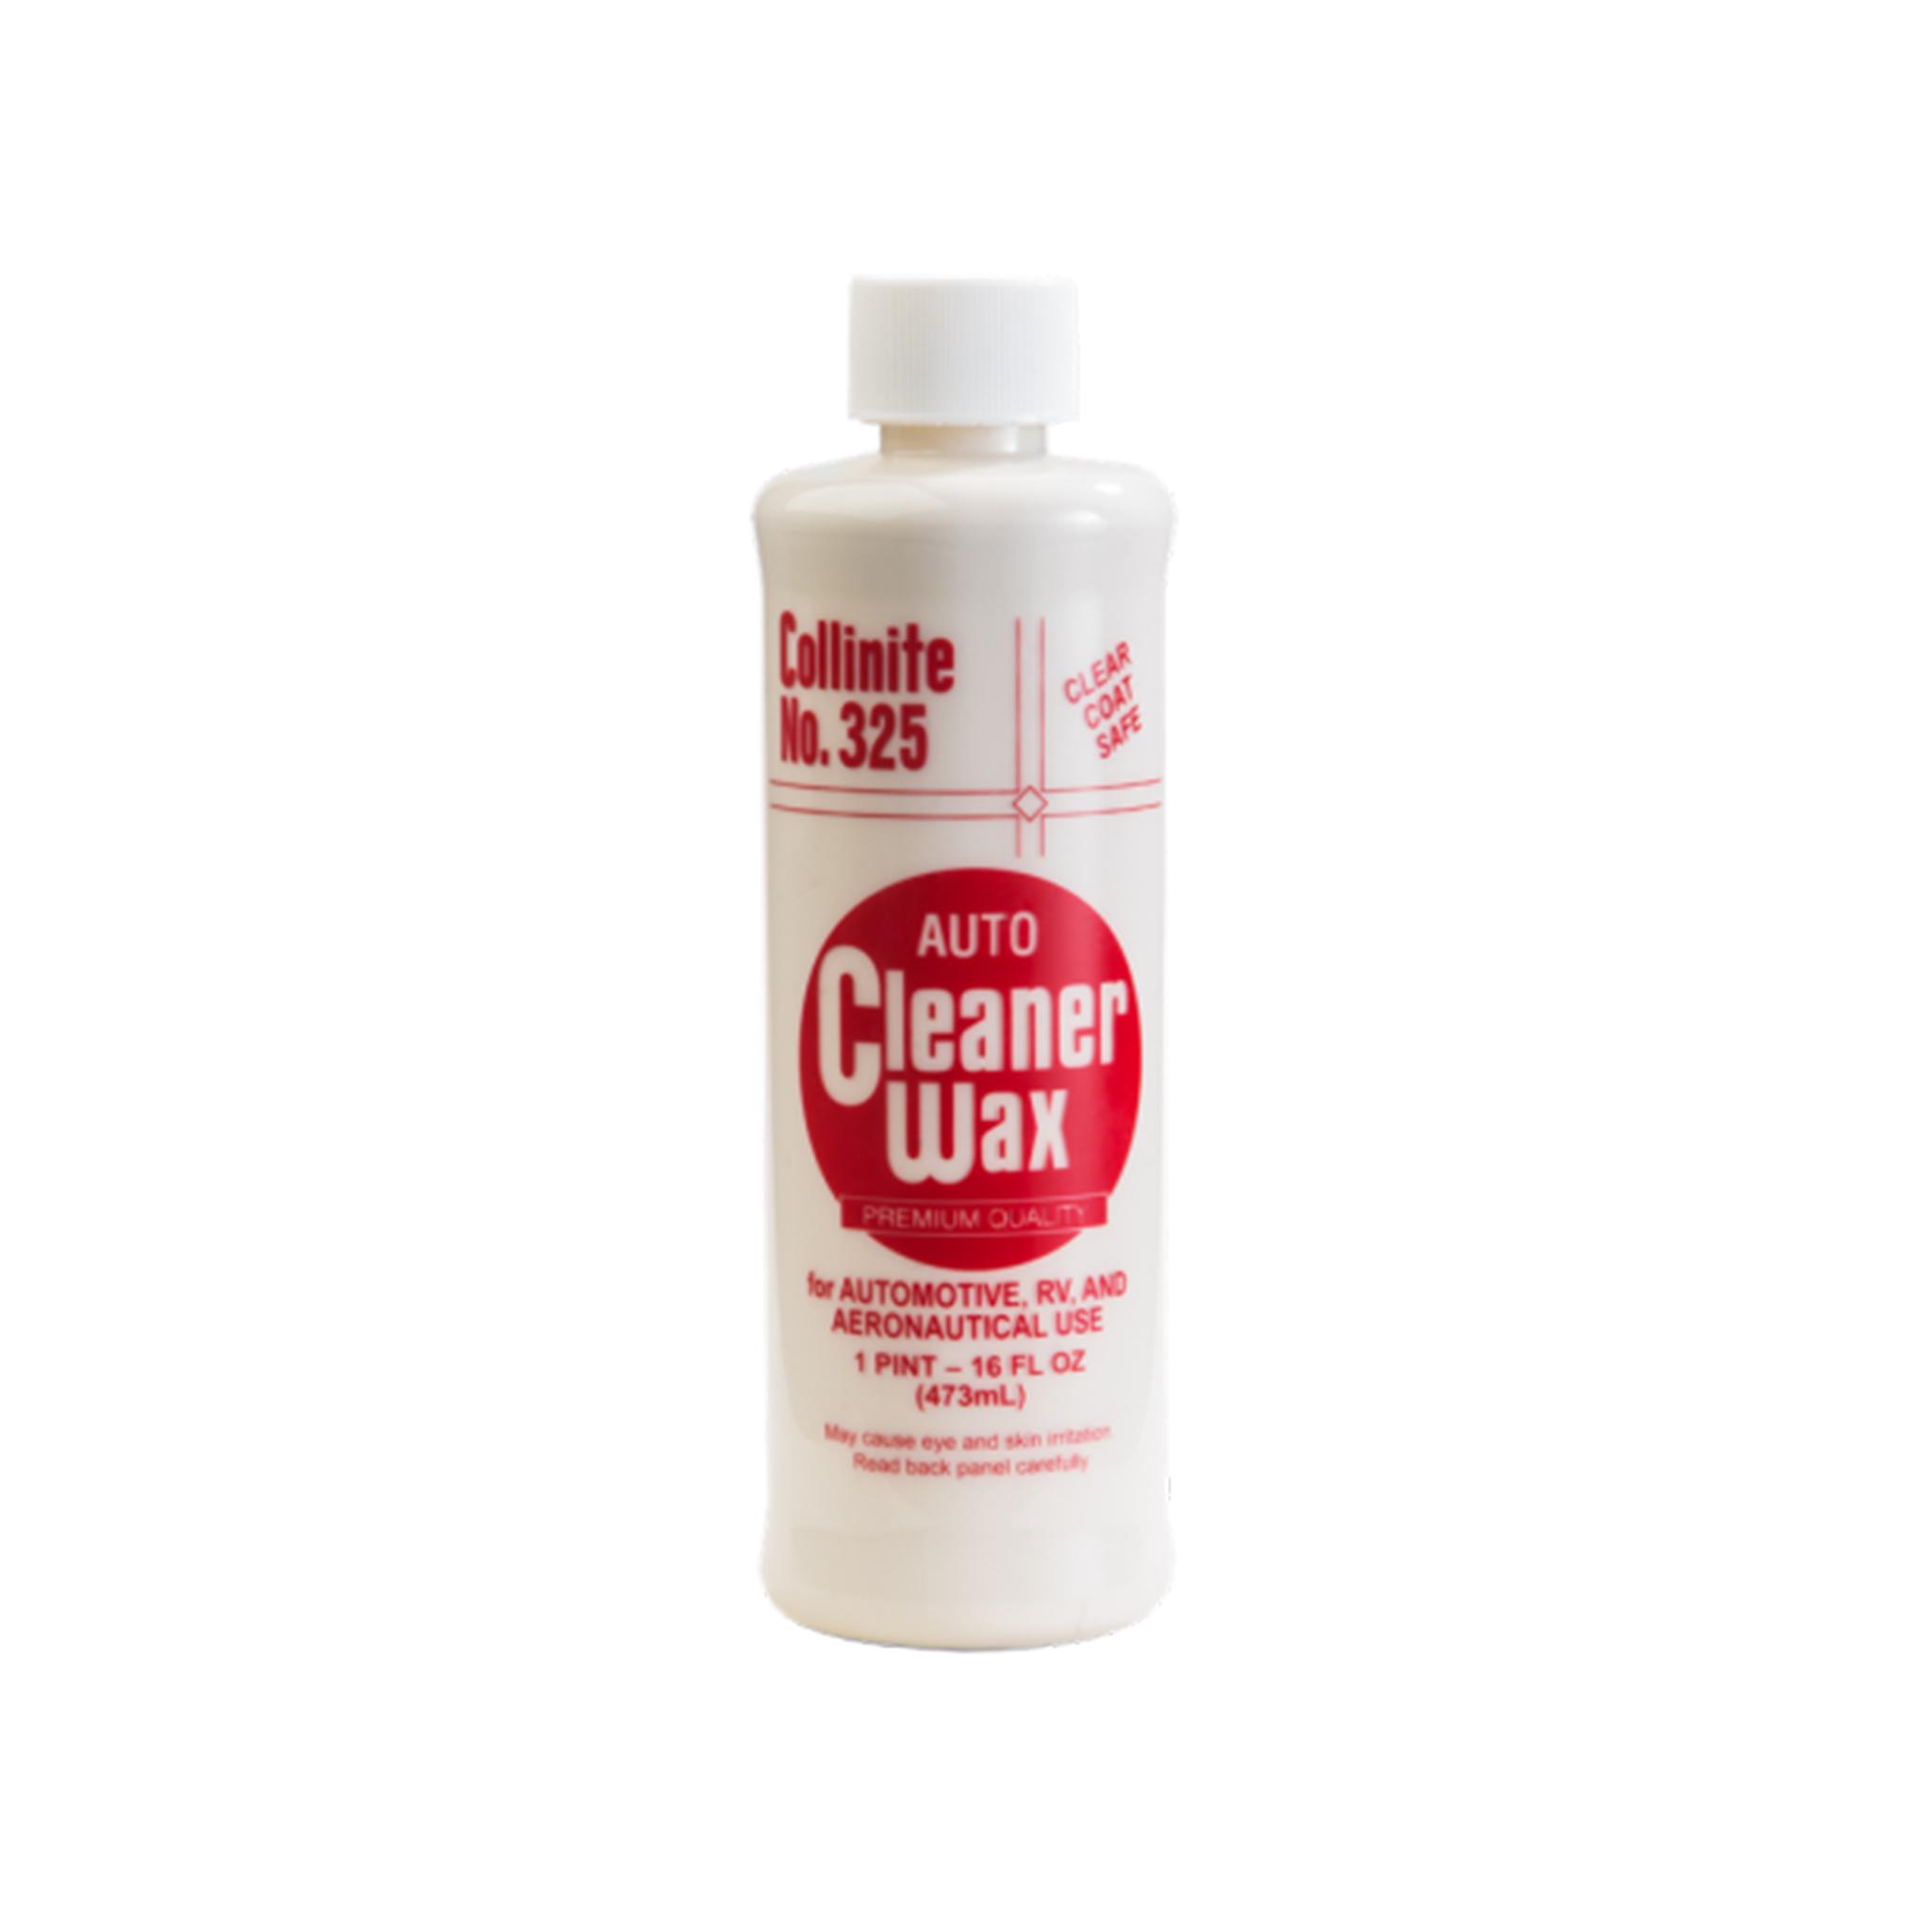 Rengörande bilvax Collinite 325 Auto Cleaner Wax, 470 ml